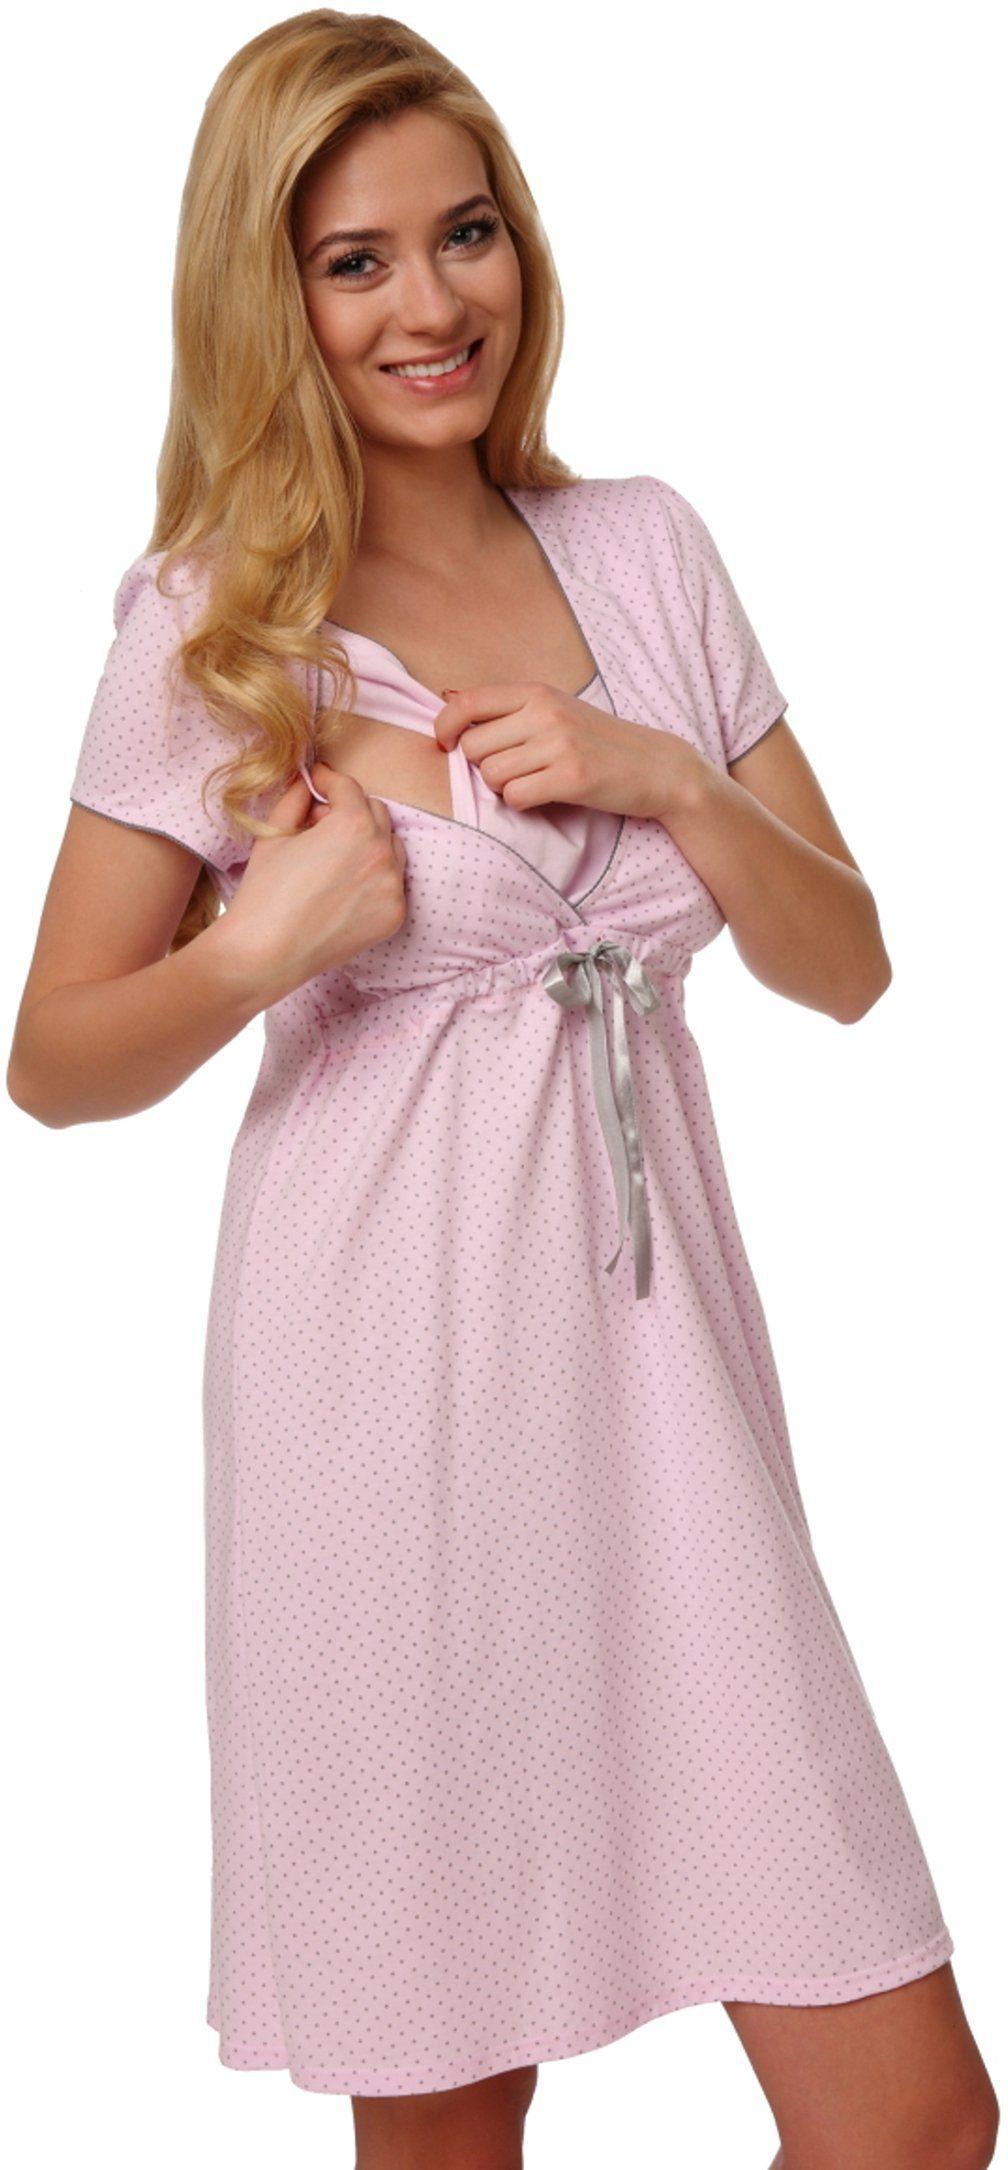 Italian fashion Koszula nocna Felicita różowa r. XL 1